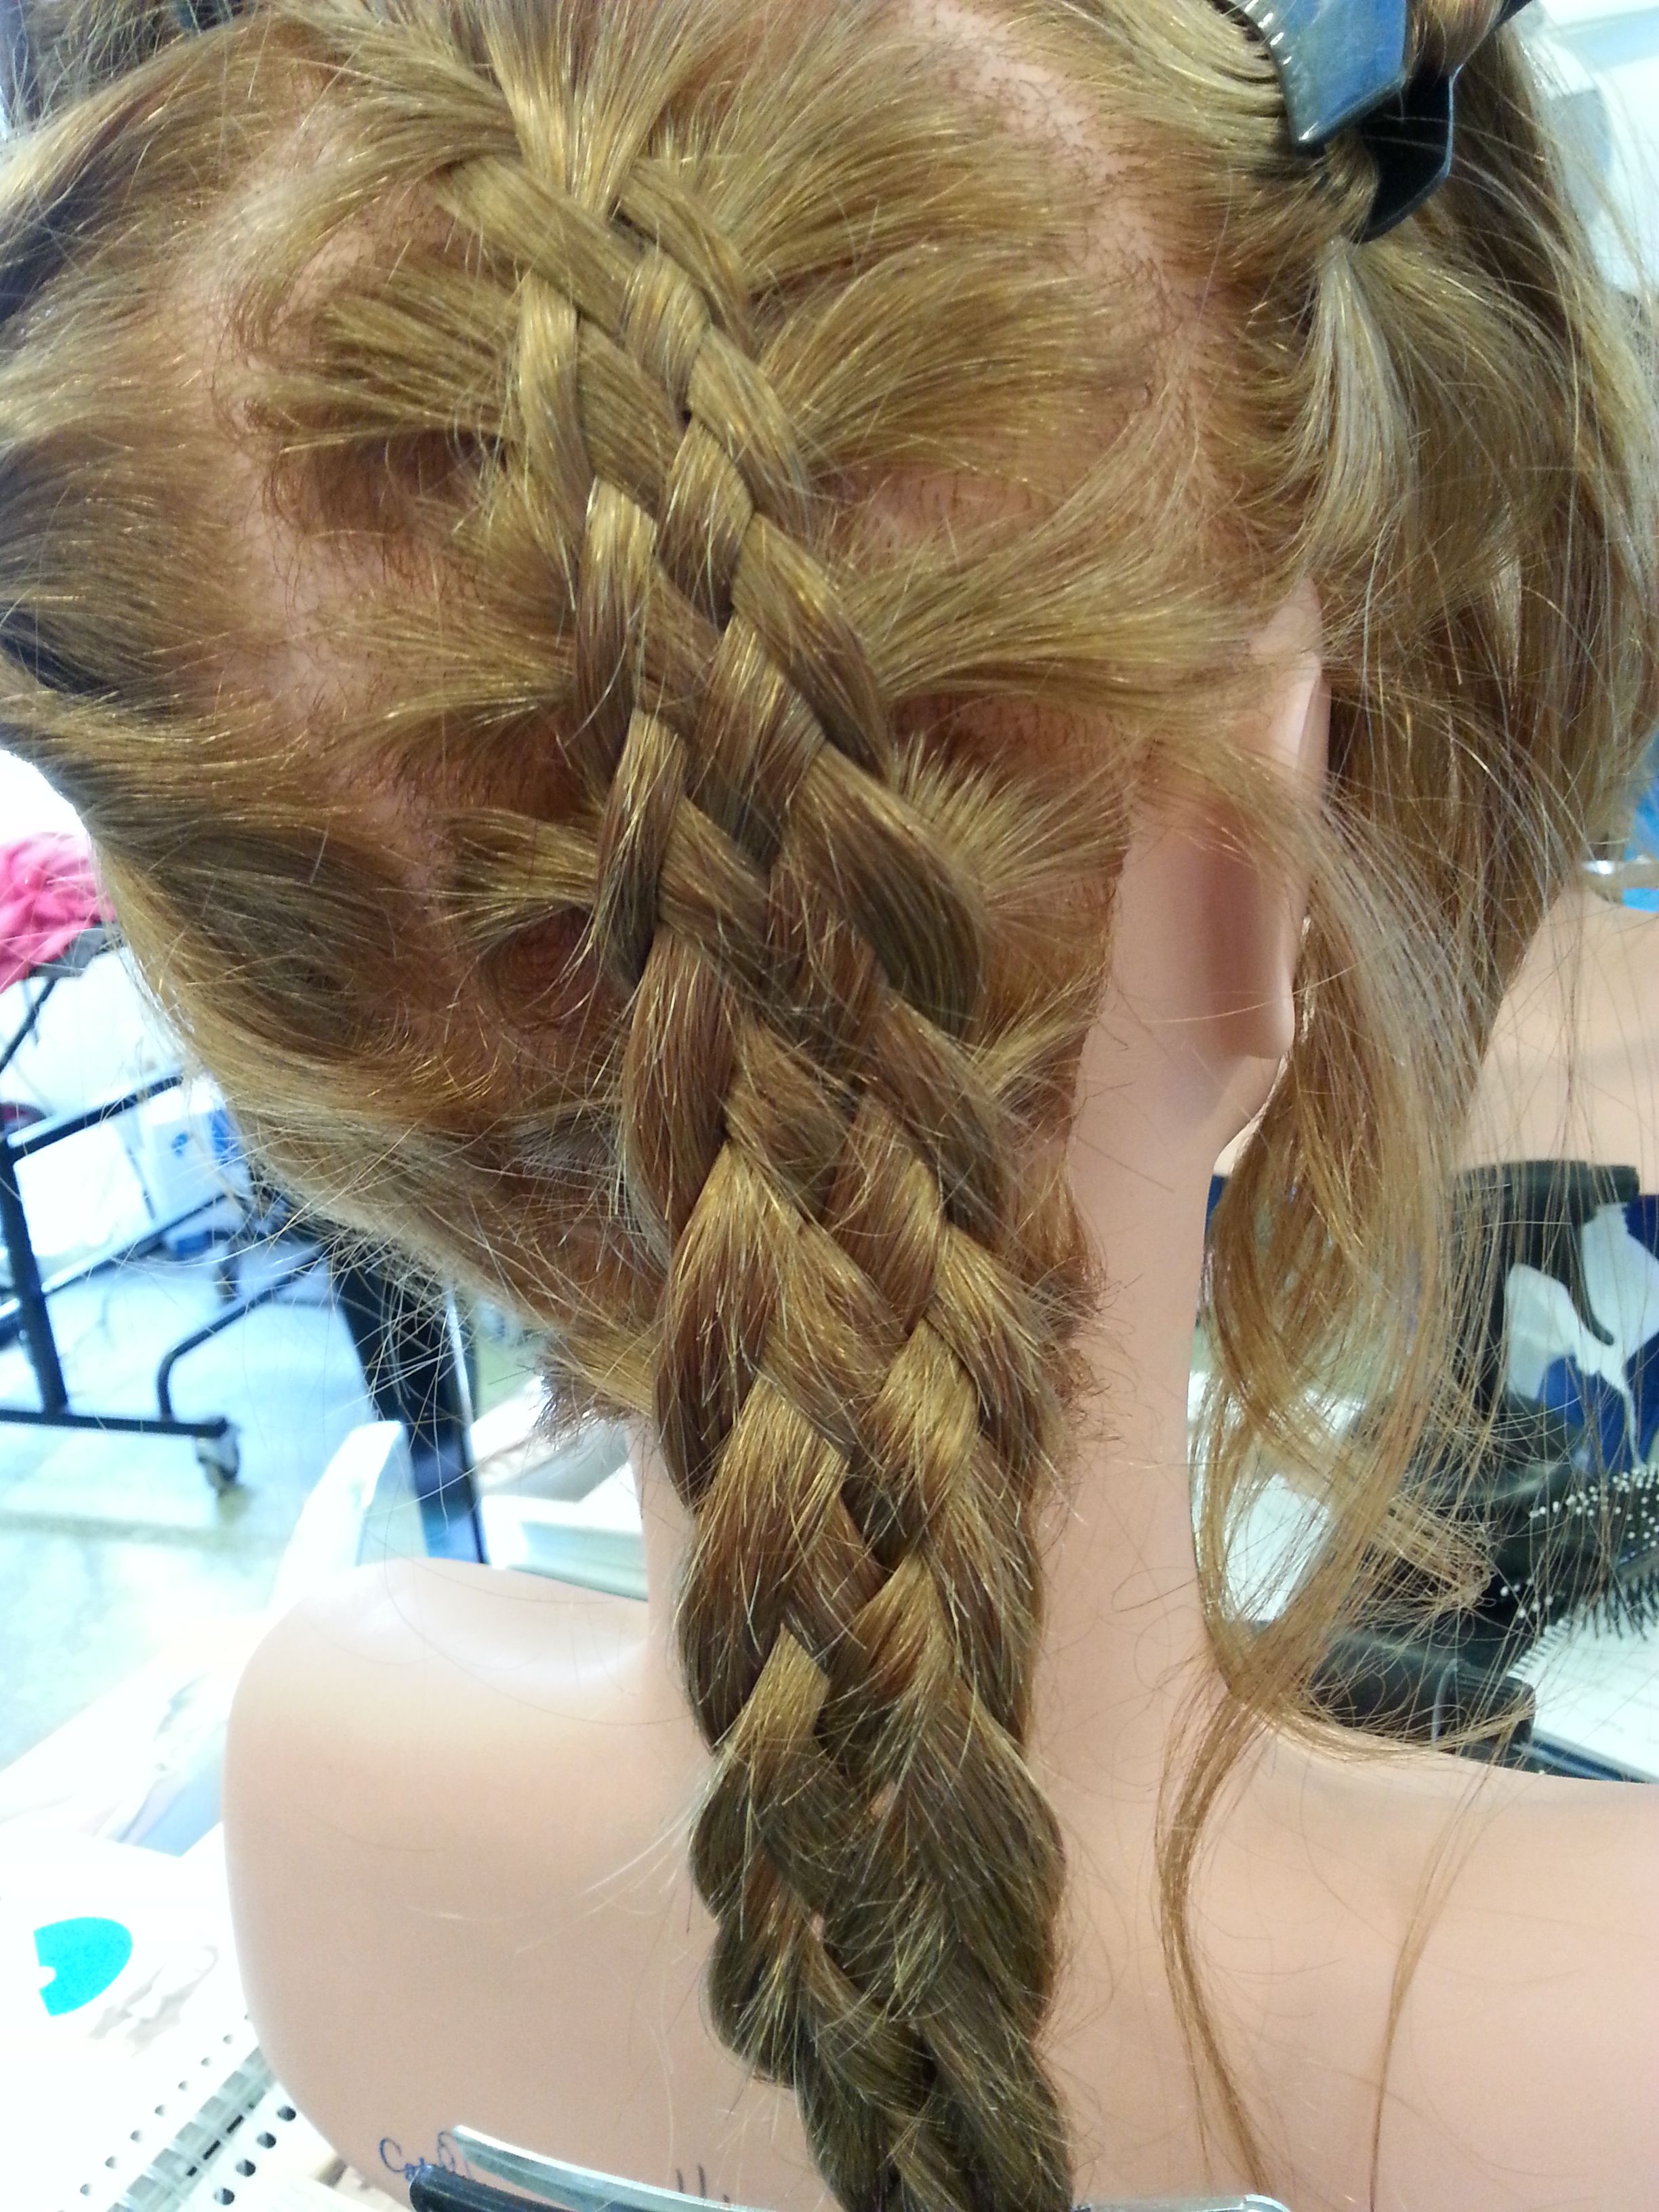 5f 246 Ld F 246 St Fl 233 Tta With Images Hair Wrap Beauty Hair